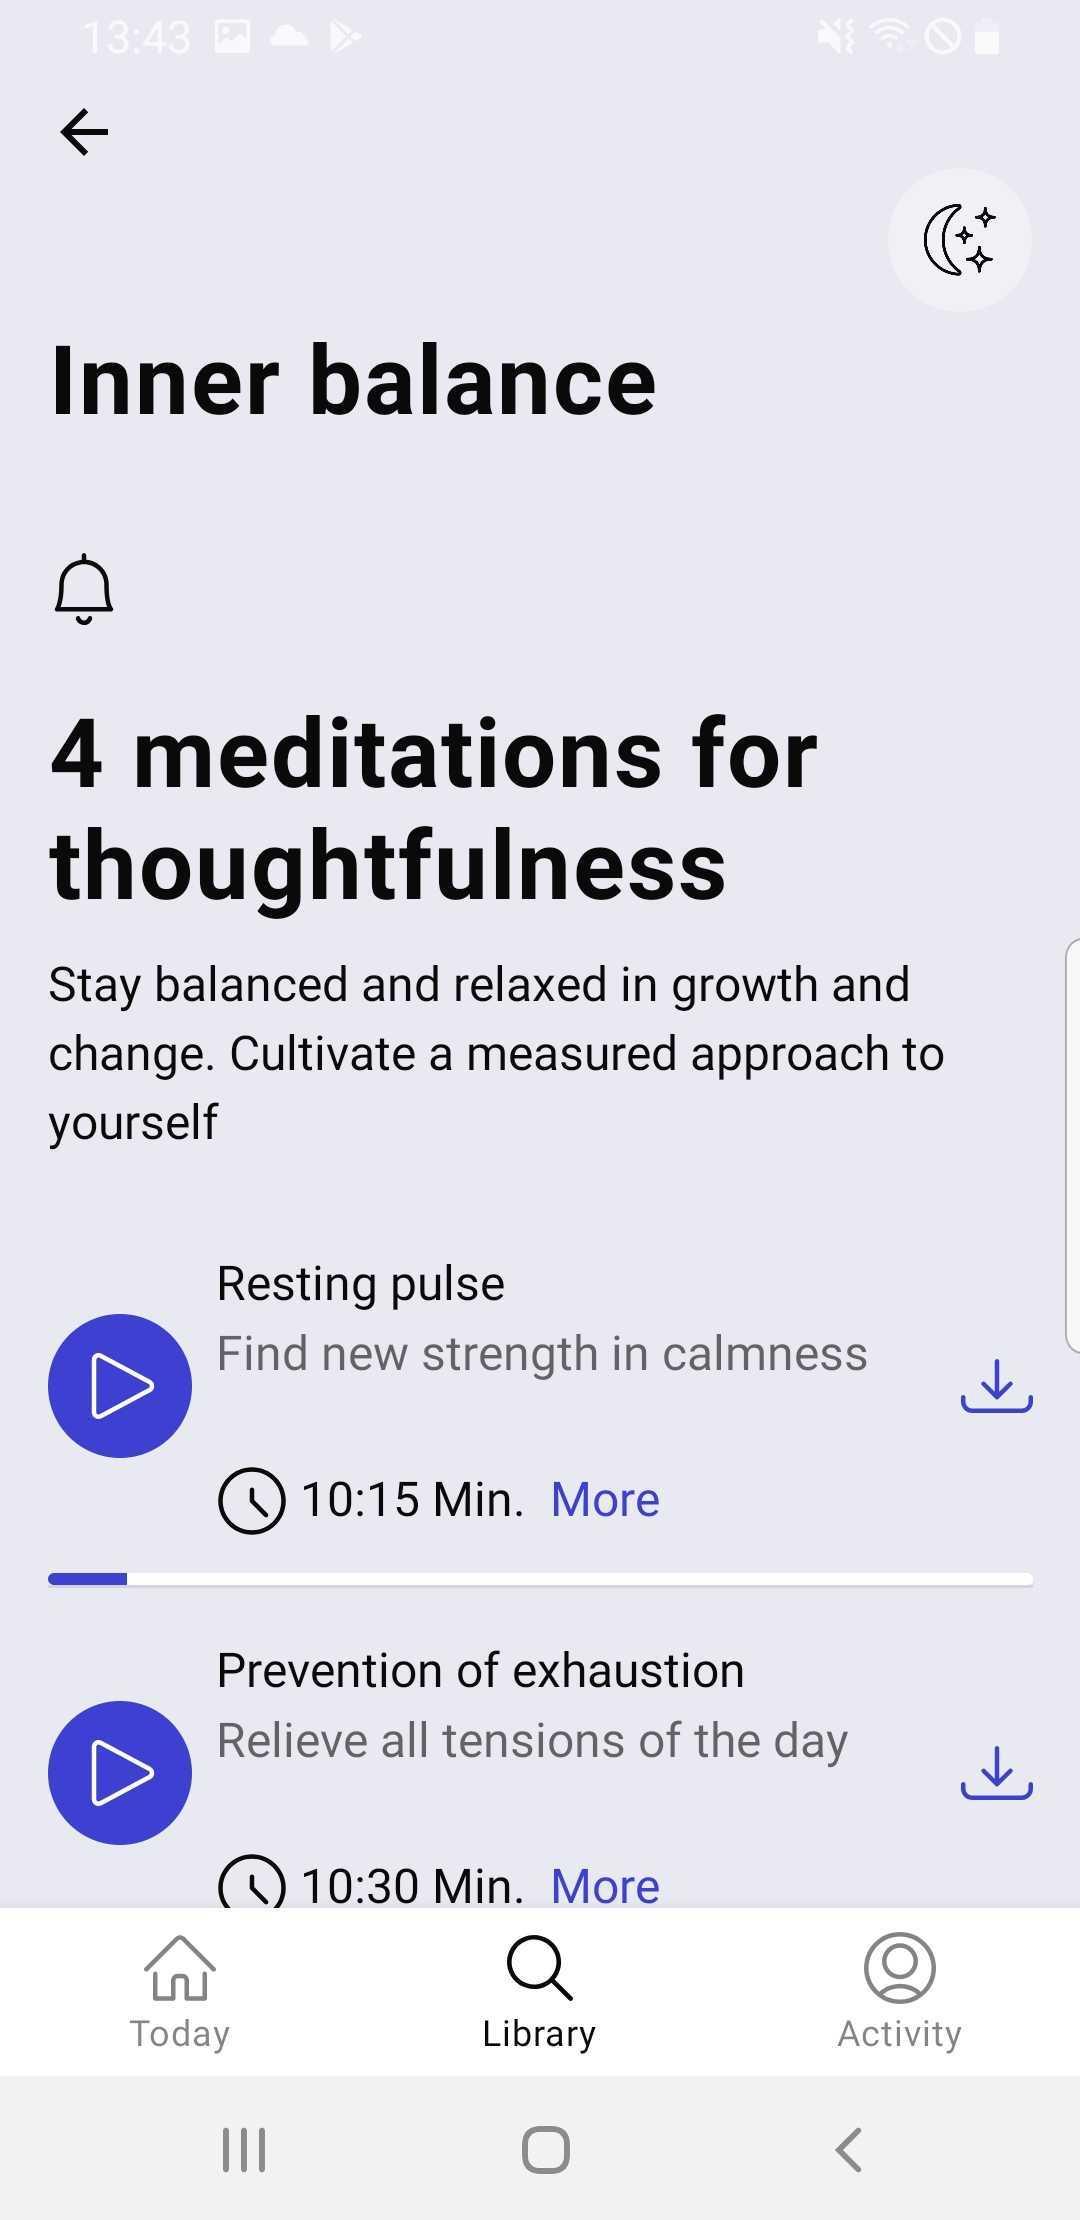 Meditations in a sleep playlist